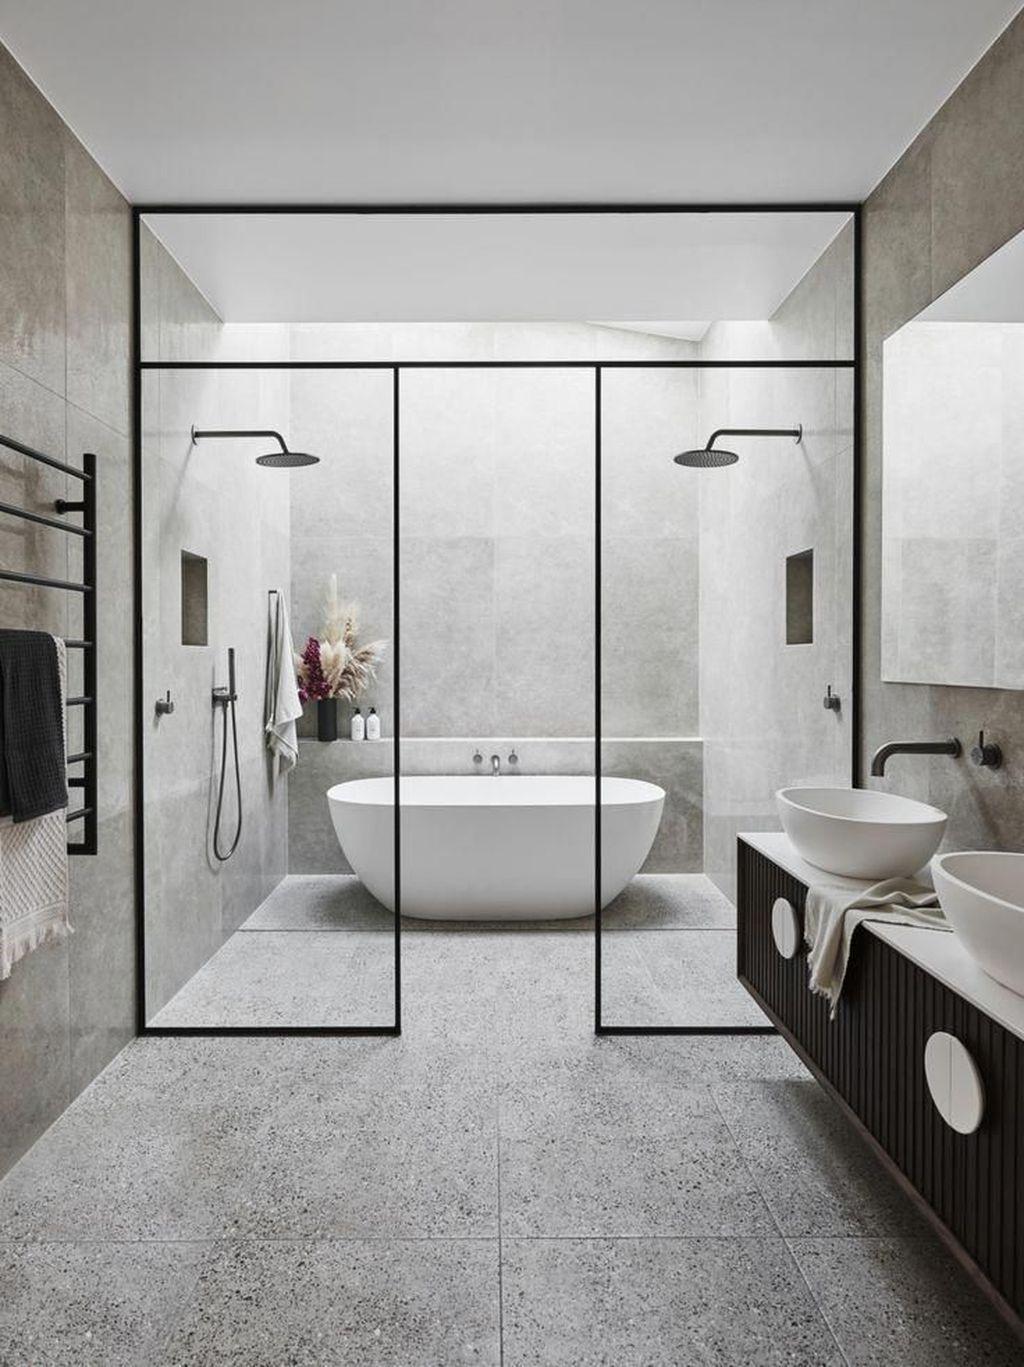 Fabulous Minimalist Bathroom Decor Ideas That Become Everyones Dream 29